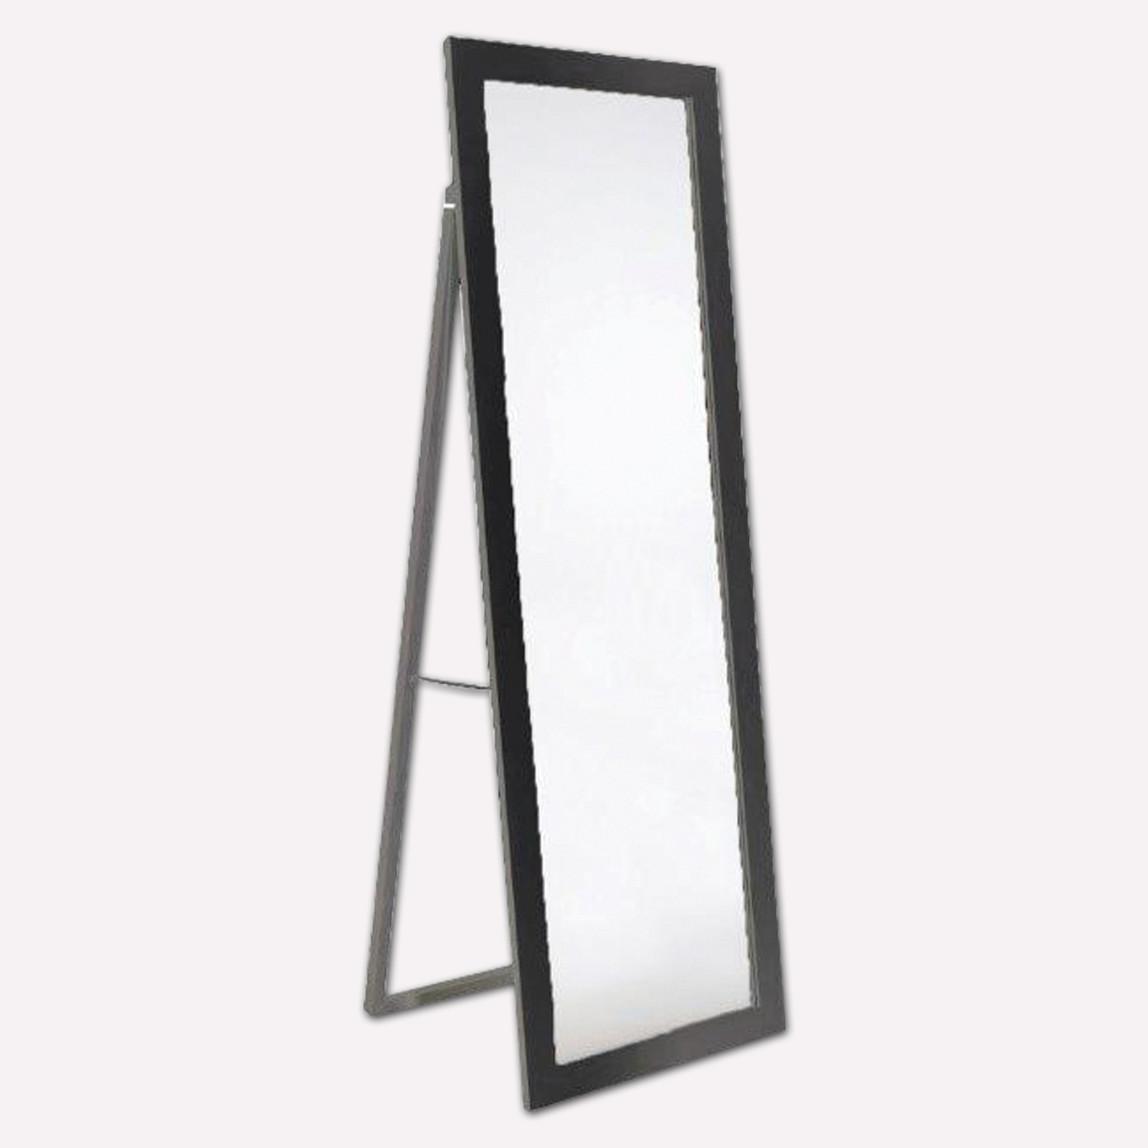 Dekoratif Ayaklı Ayna 50x150cm Siyah